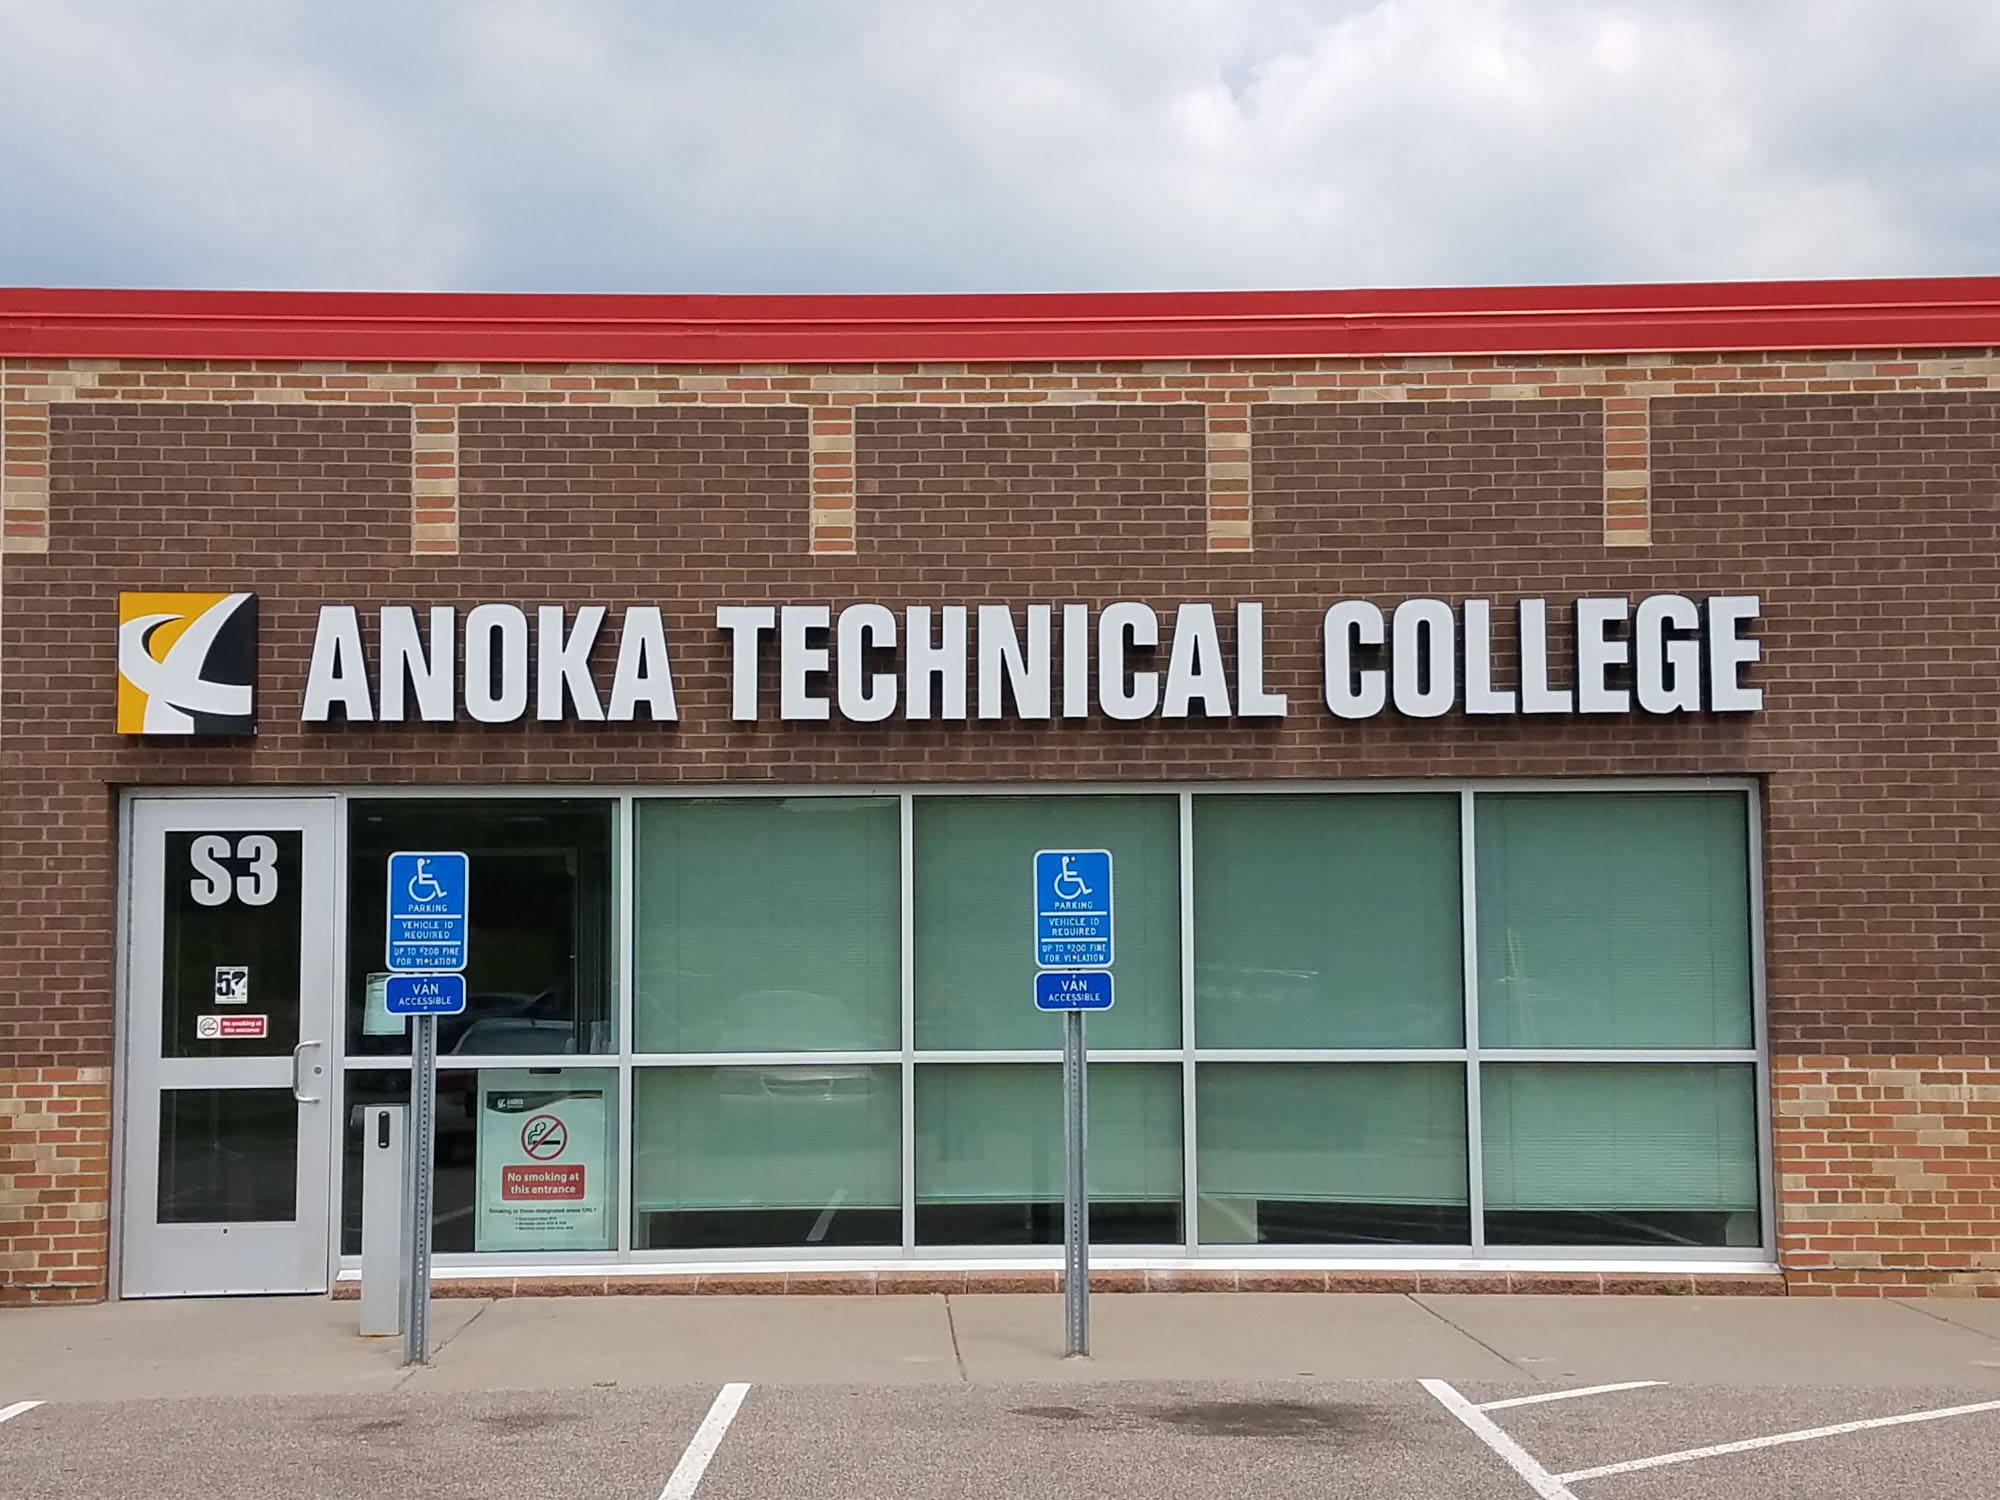 Anoka Technical College Anoka, Minnesota LED illuminated channel letters Direct mount installation